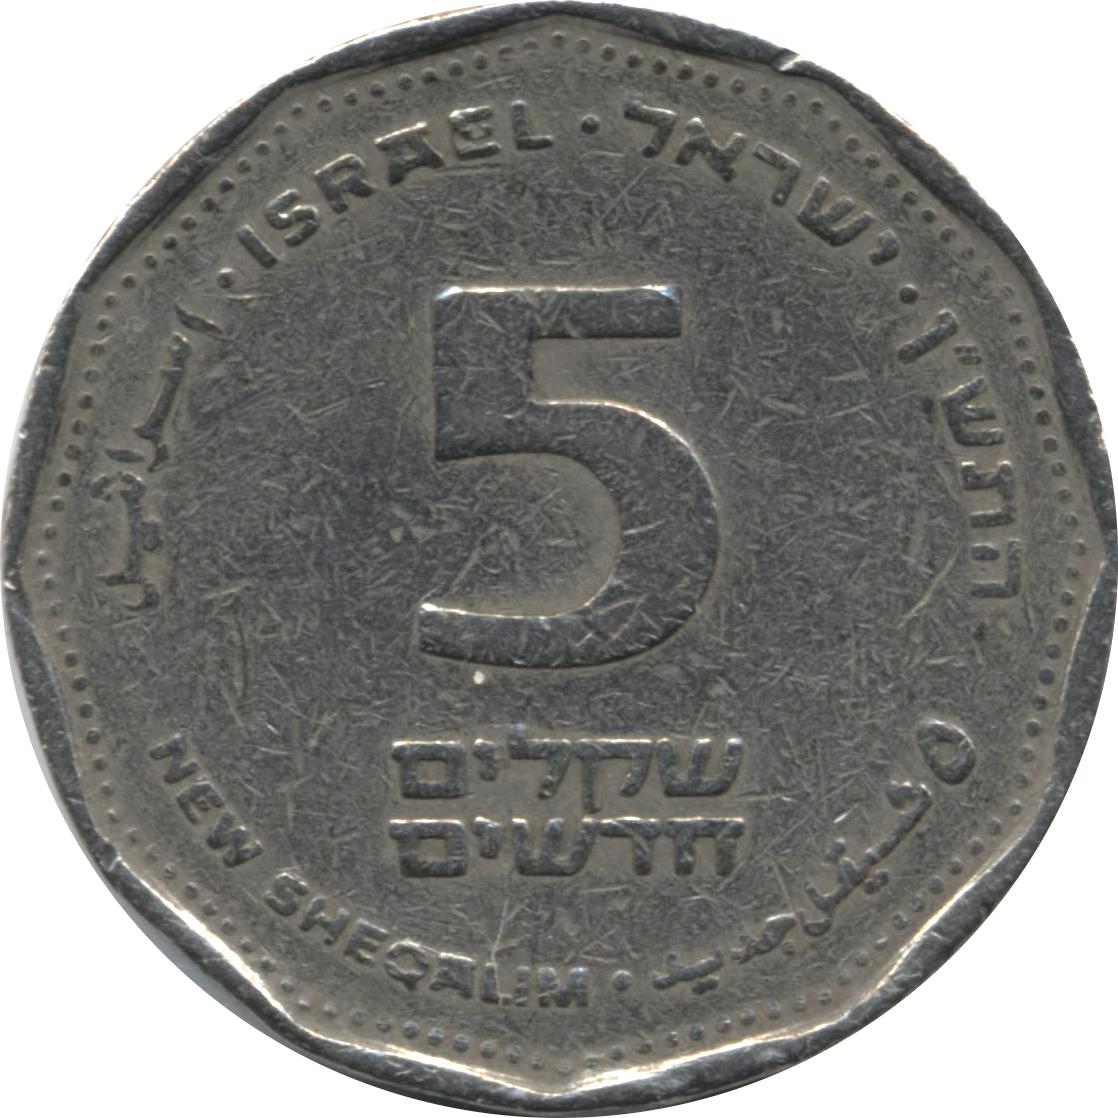 Israel 100 Sheqalim Shekel Banknote 1979 AU-UNC